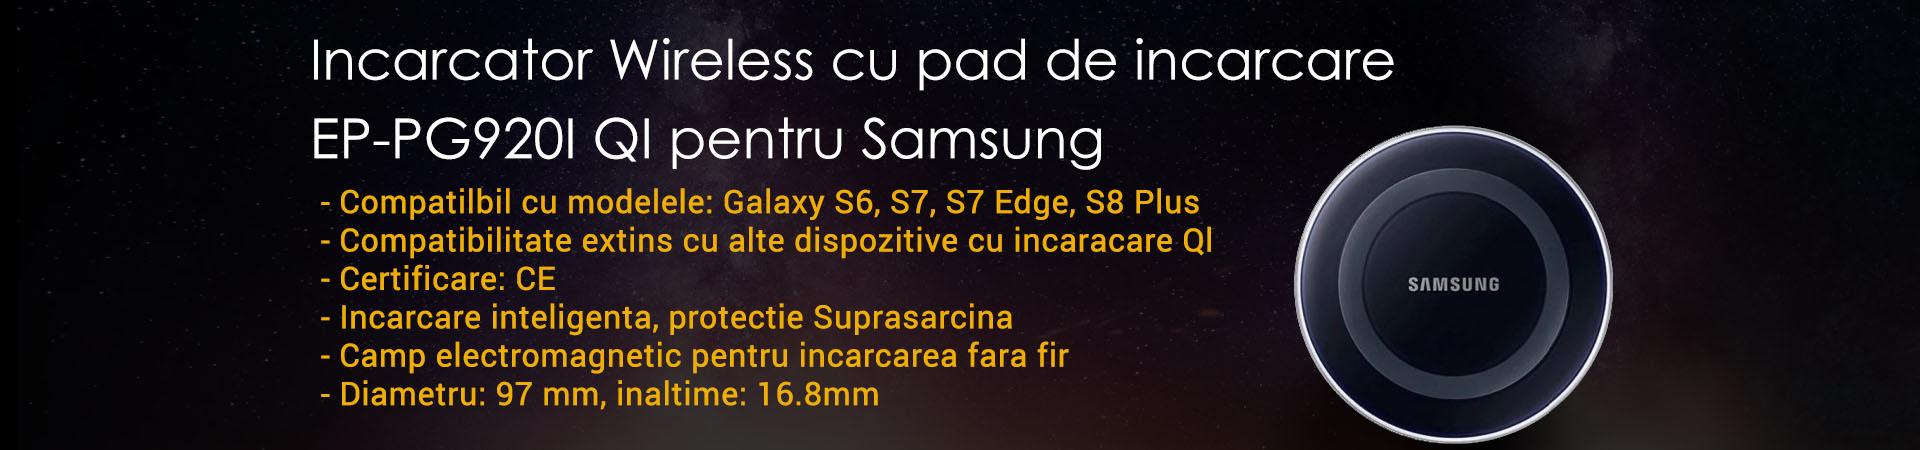 Incarcator Wireless cu pad de incarcare EP-PG920I QI